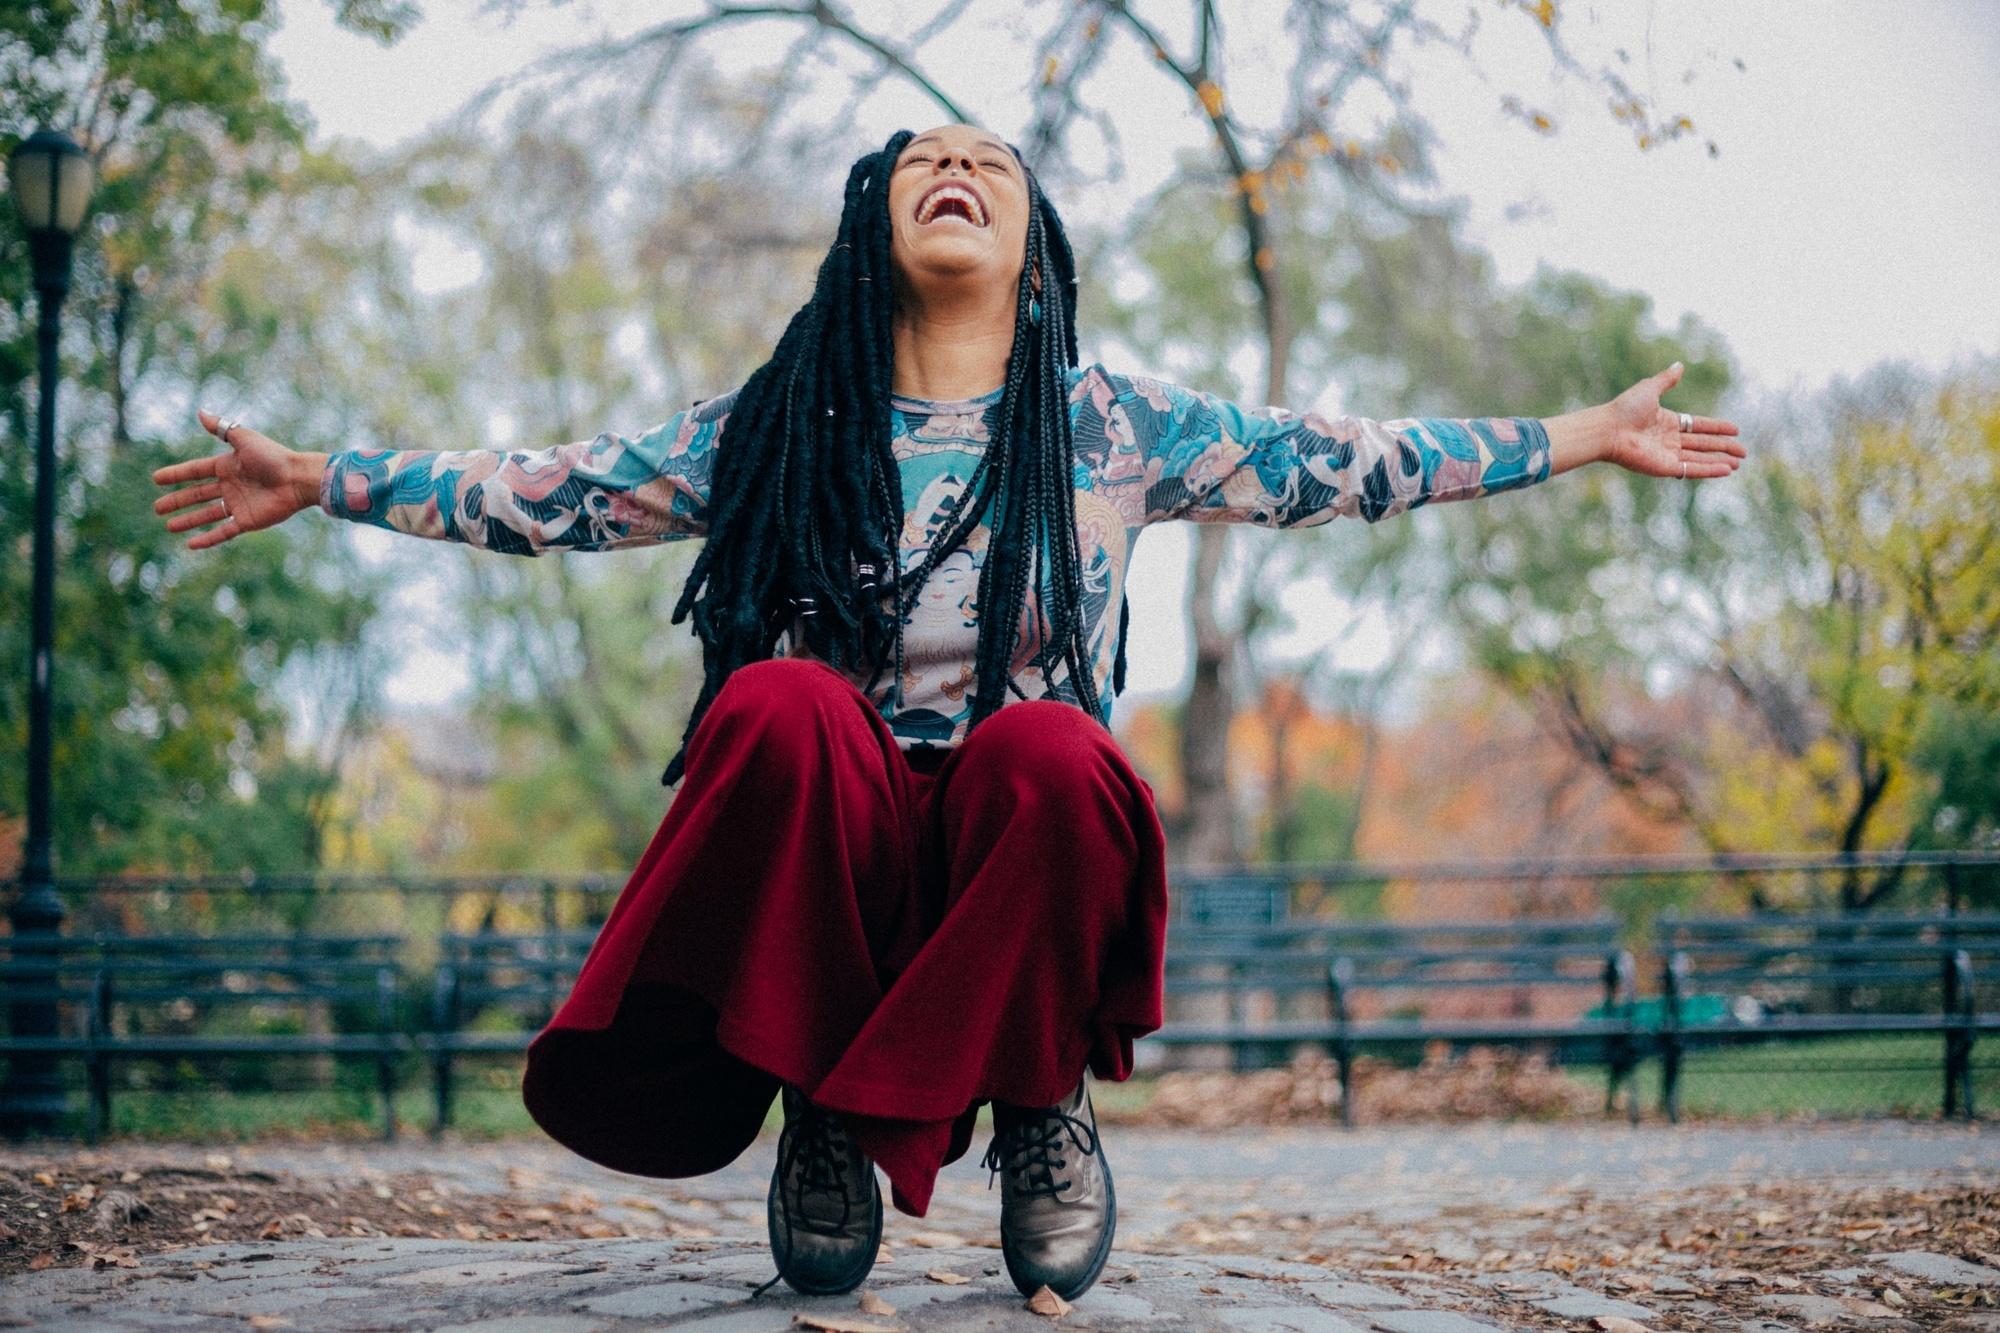 Monica.Justesen.Photography.Creative.Portrait.Photographer.New.York.04.jpg